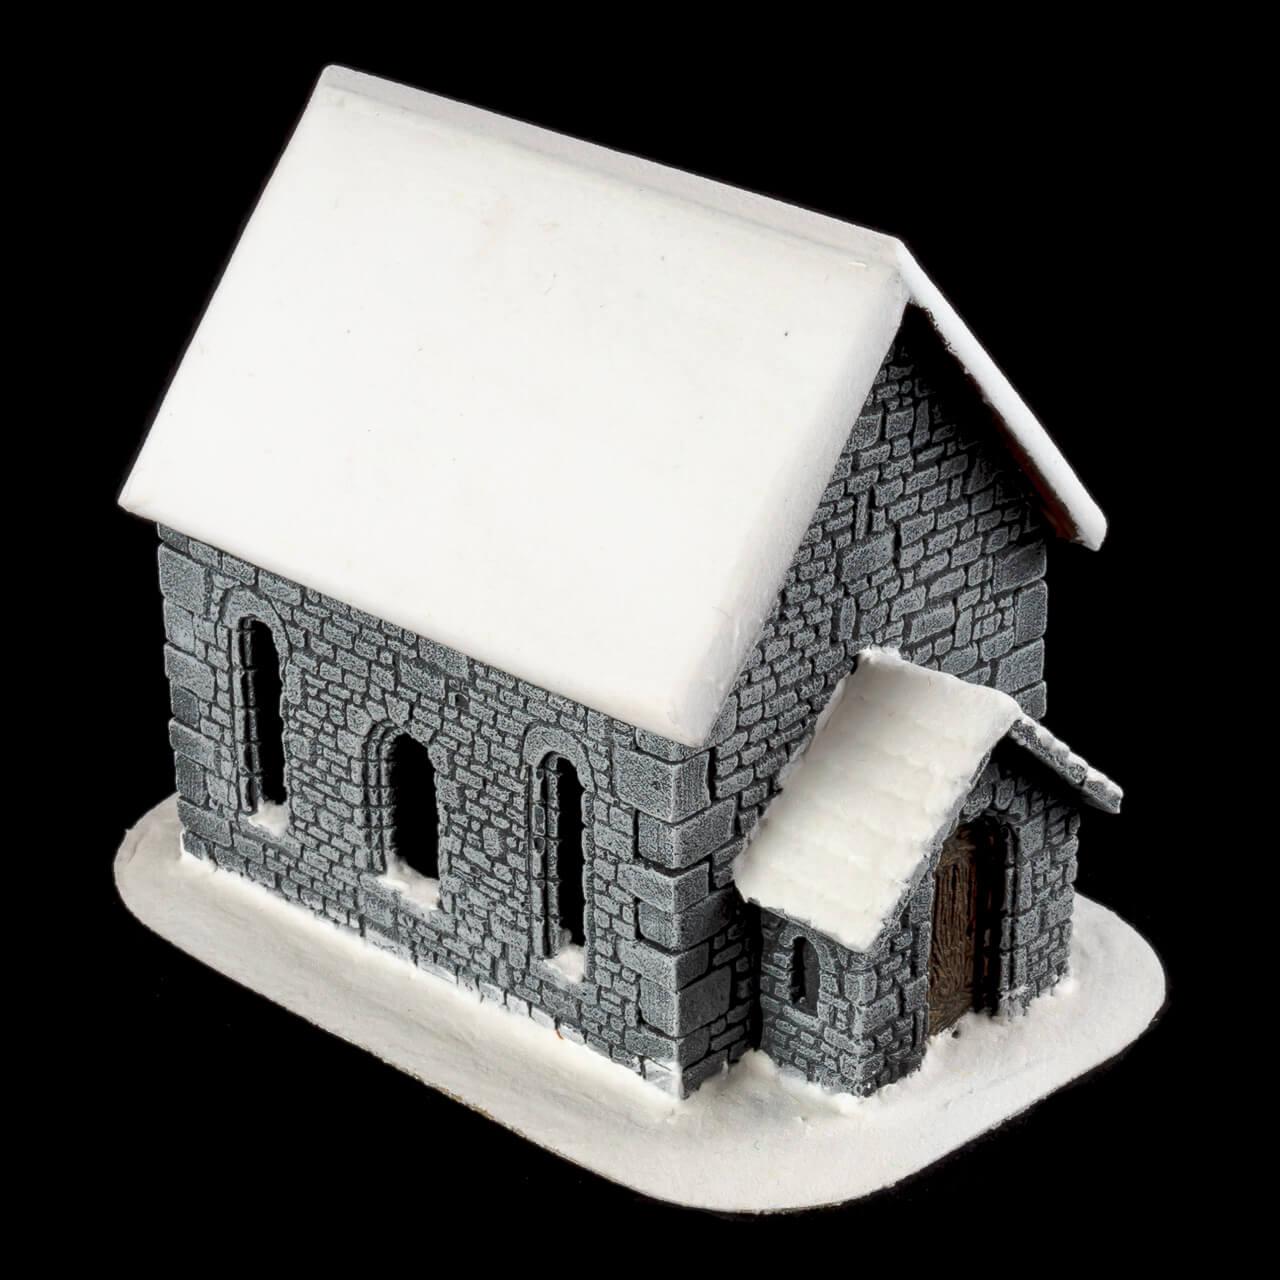 1. Produktabbildung - Schneebedeckte Kapelle